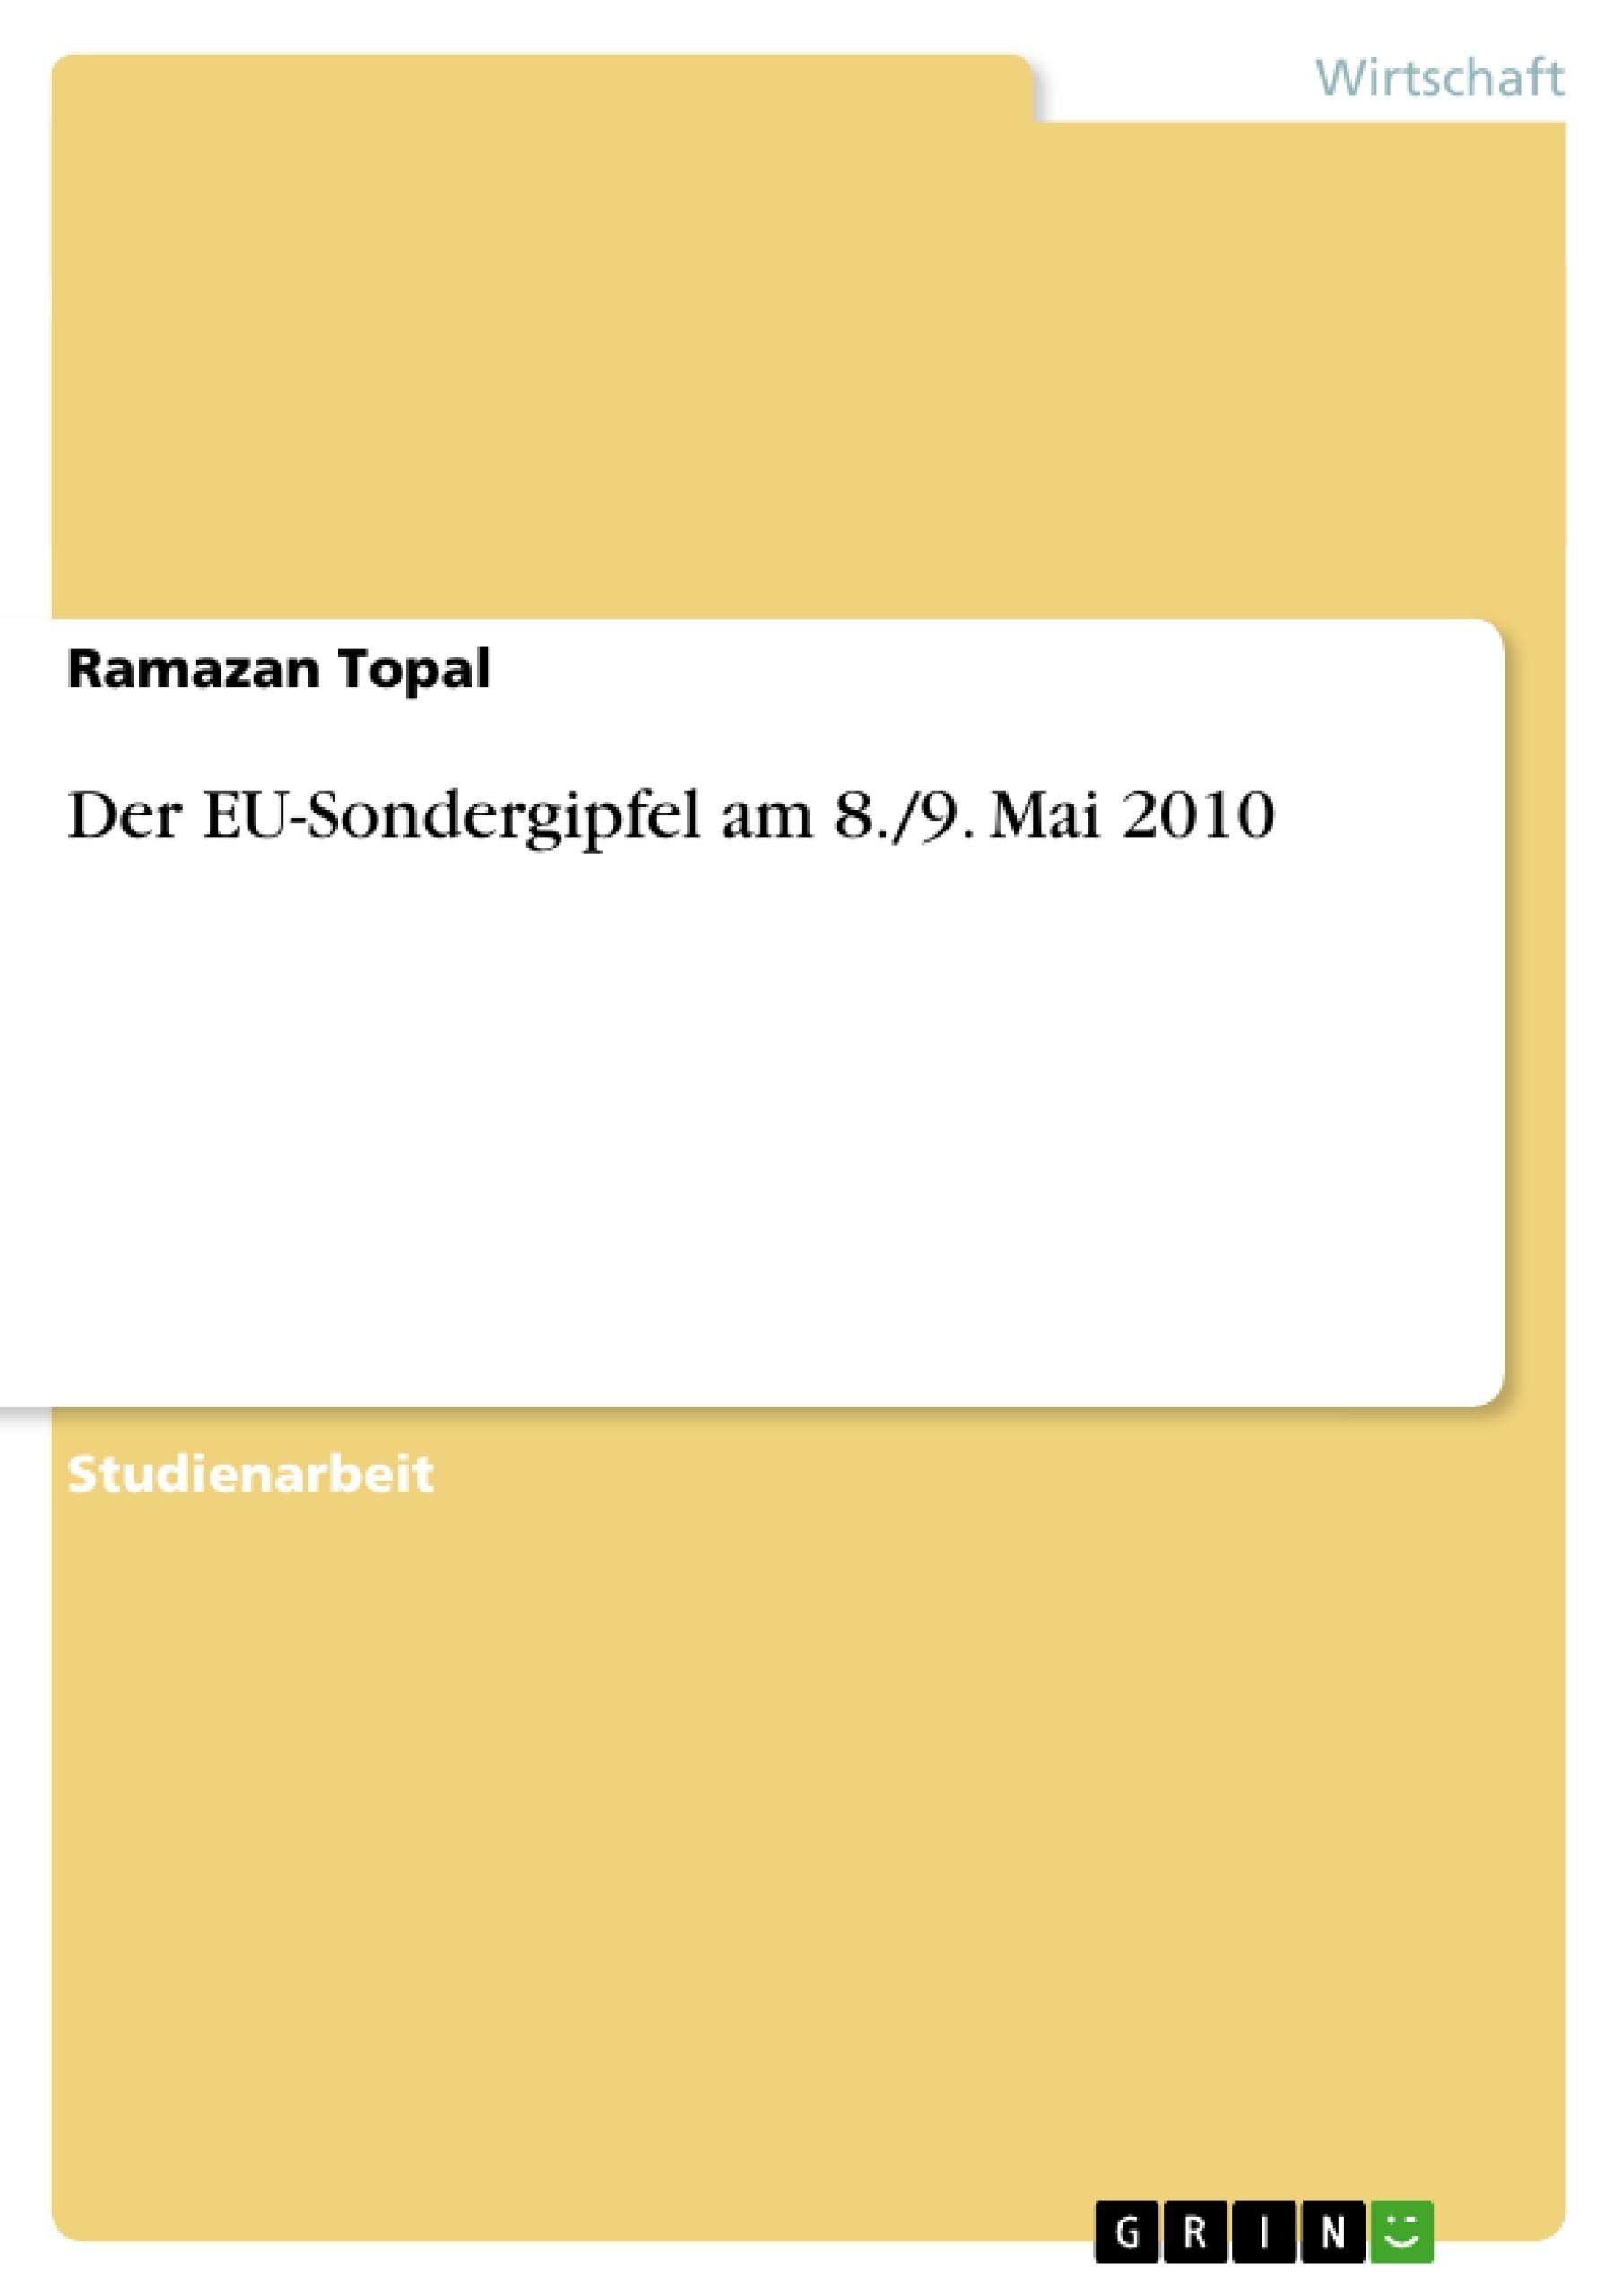 Titel: Der EU-Sondergipfel am 8./9. Mai 2010